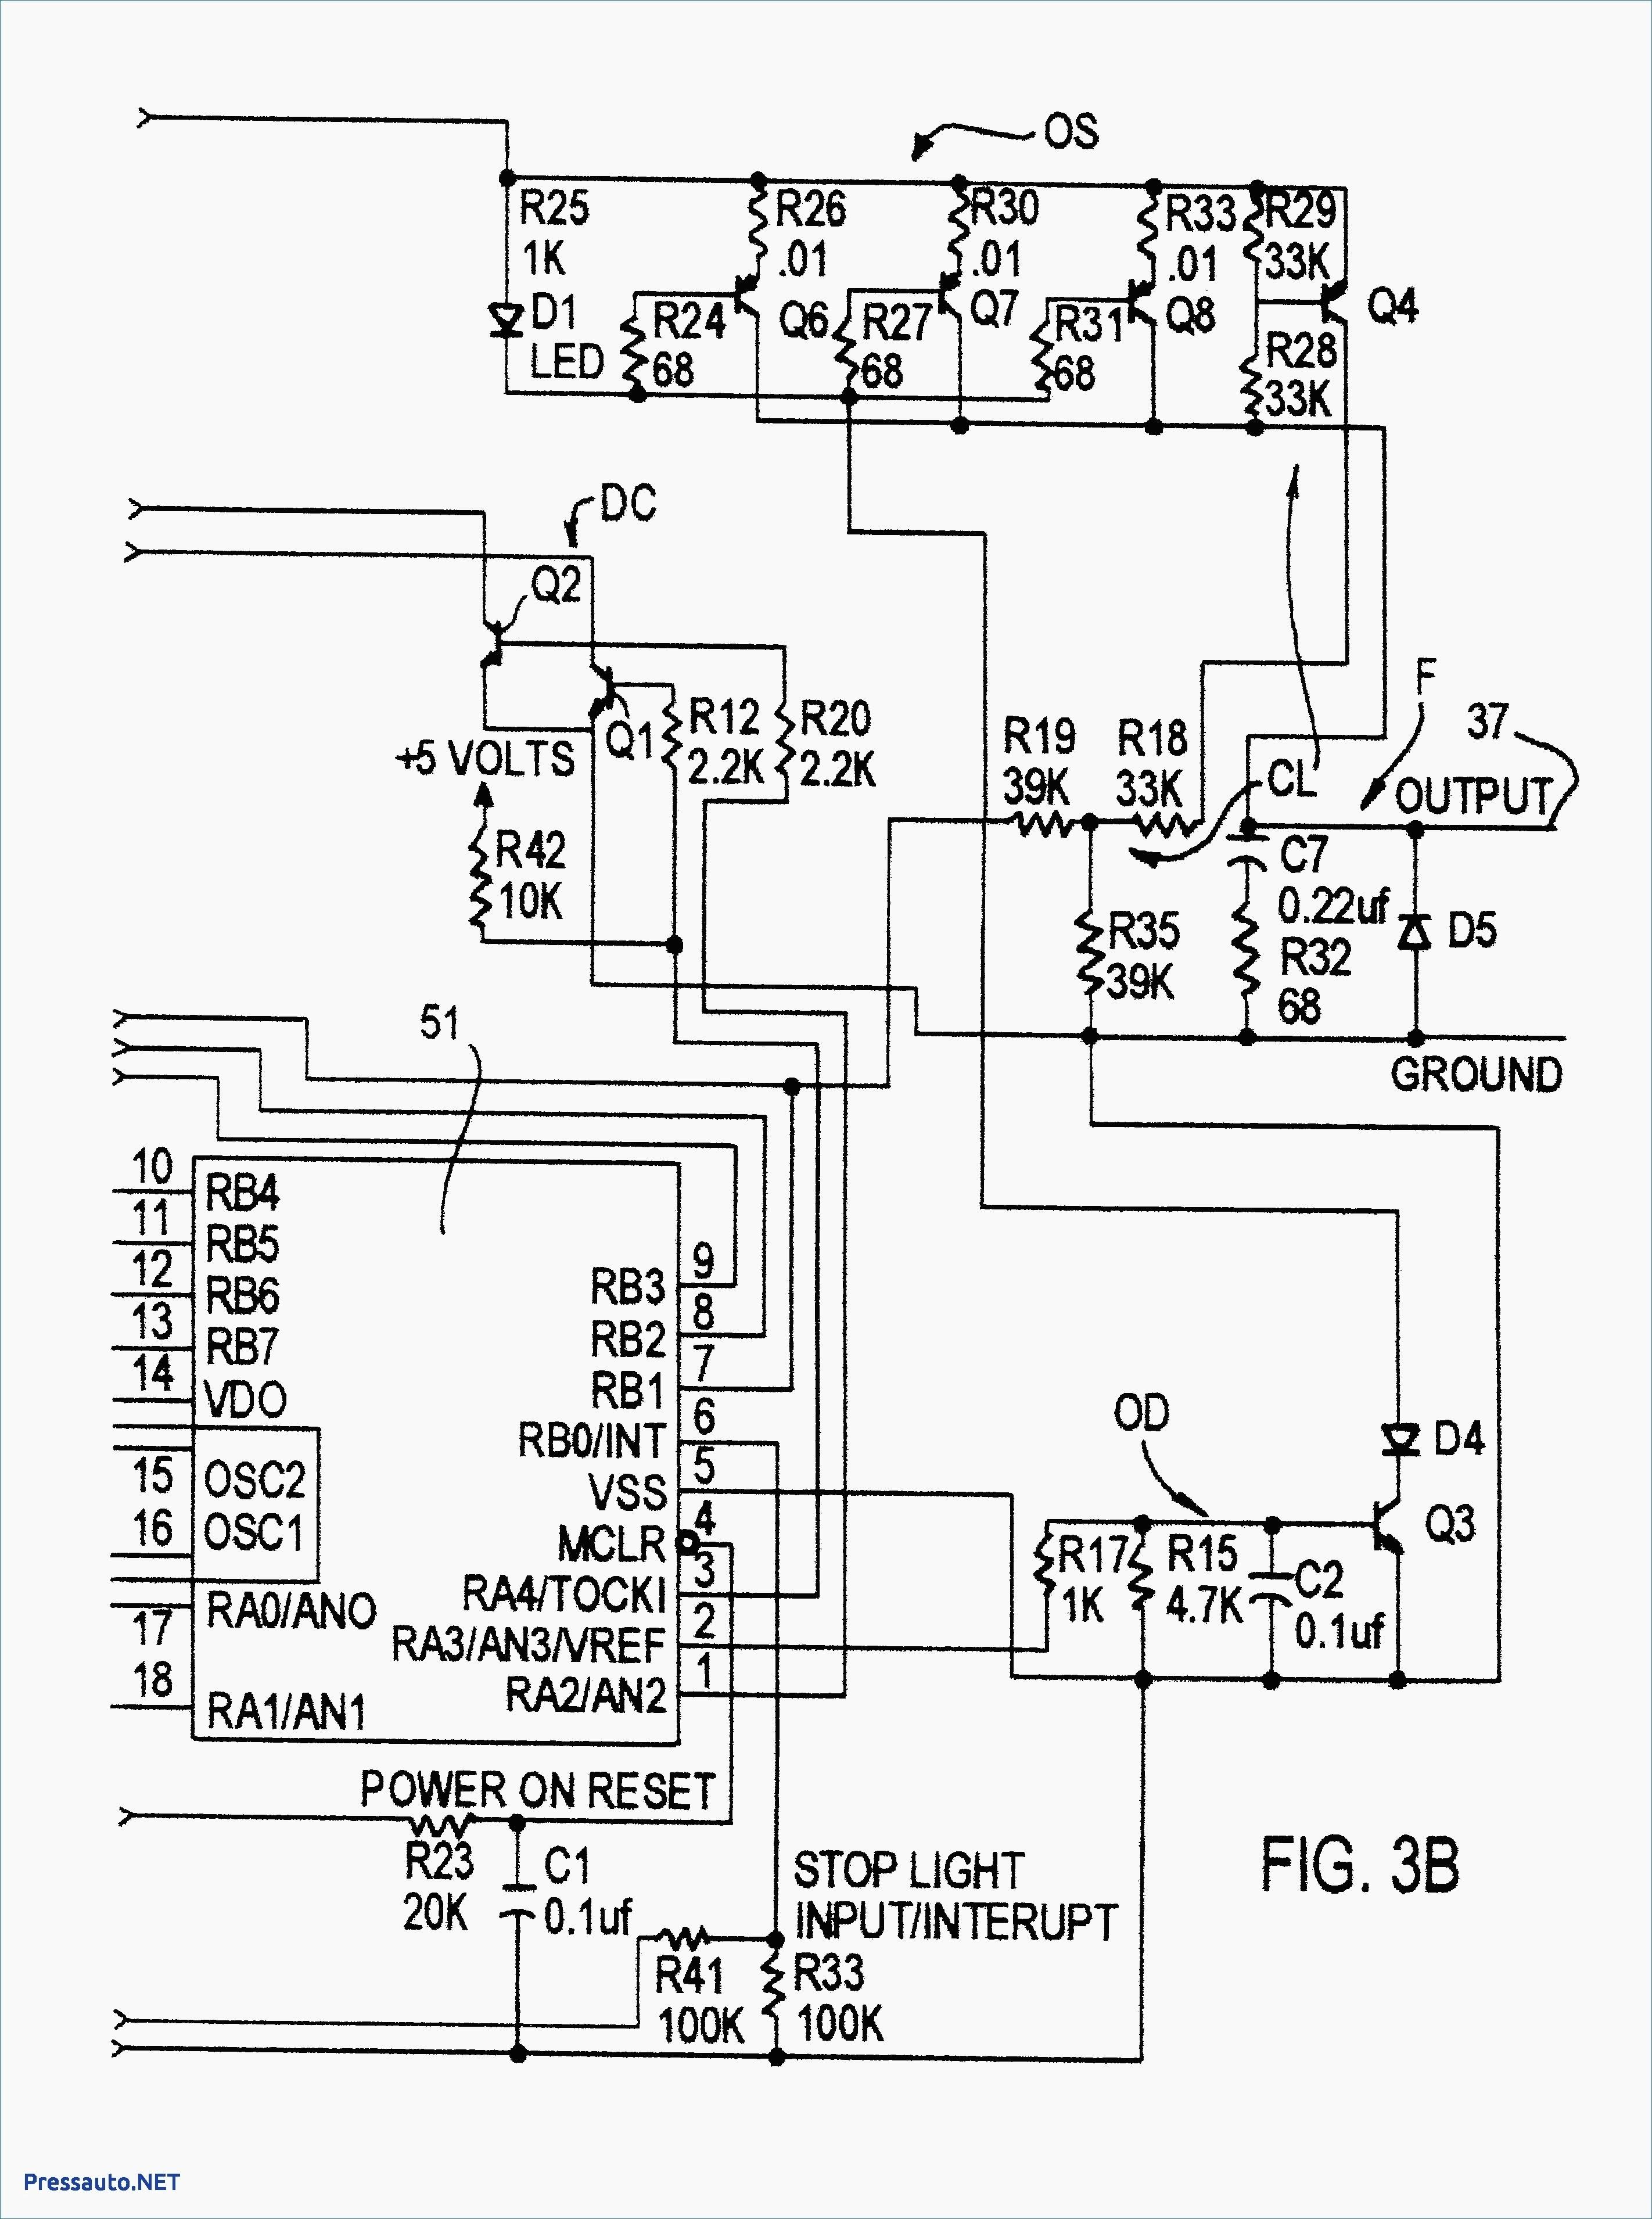 electric motor brake wiring diagram Download-Electric Motor Brake Wiring Diagram Wiring Diagram for Brake Controller New Electric Circuit Diagram Inspirational 13-i